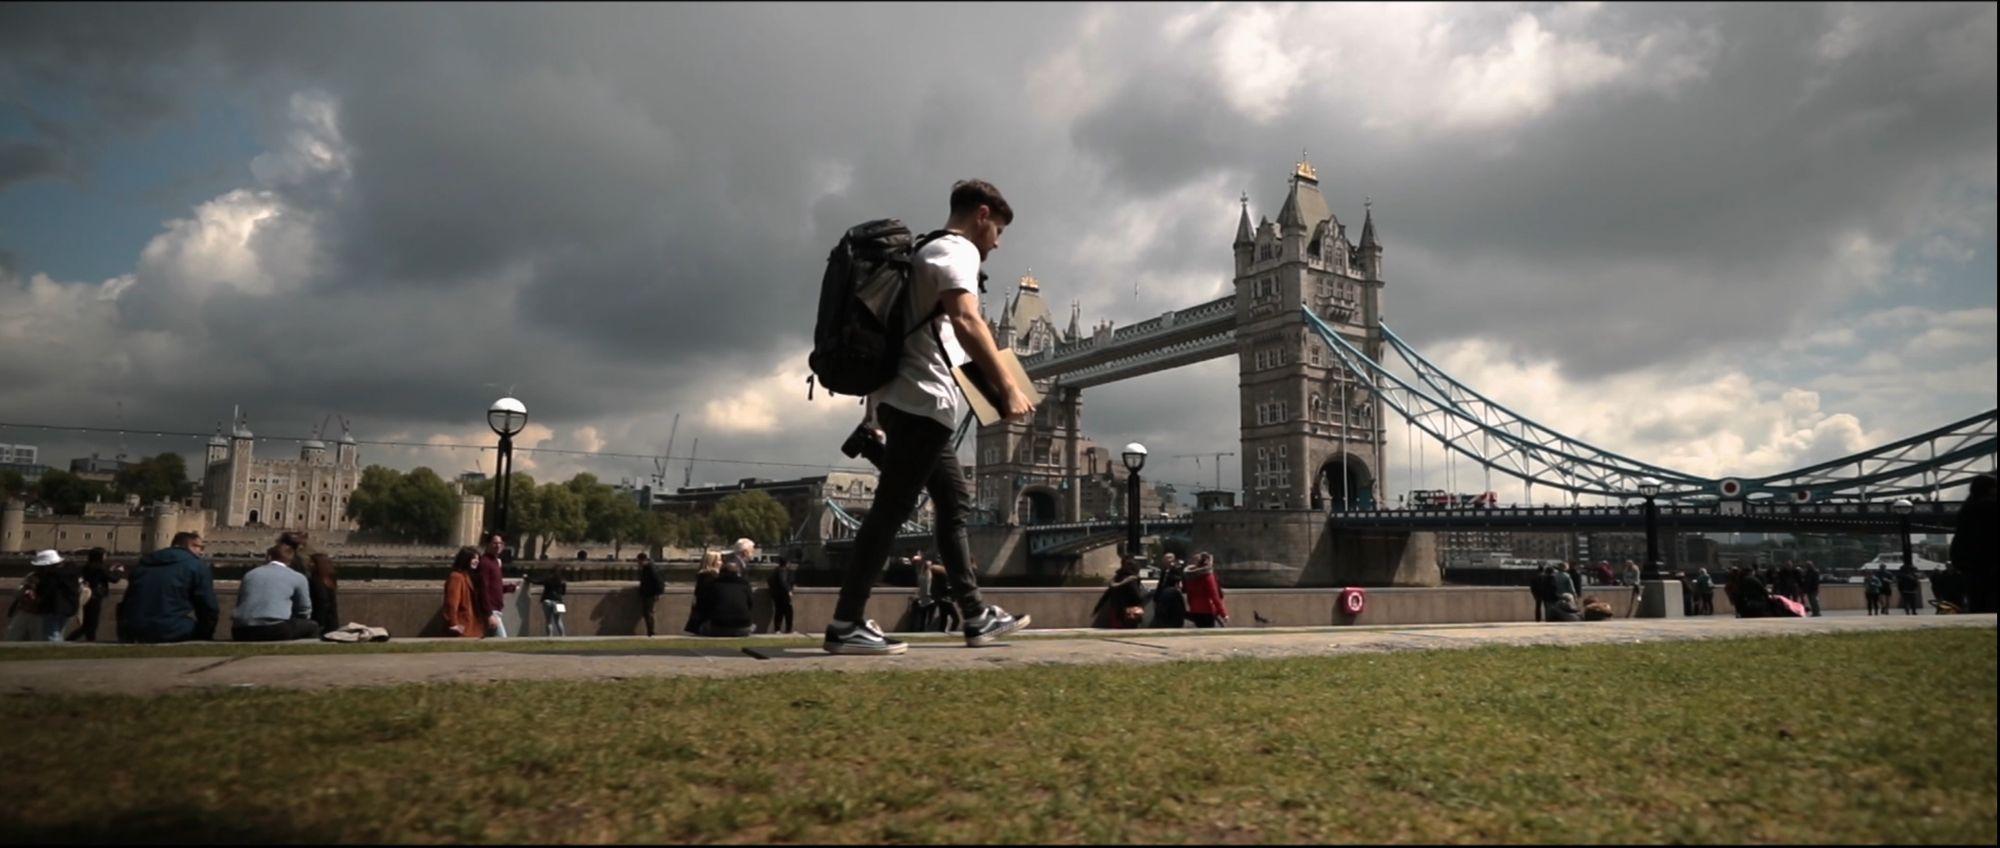 Film location near the Tower Bridge